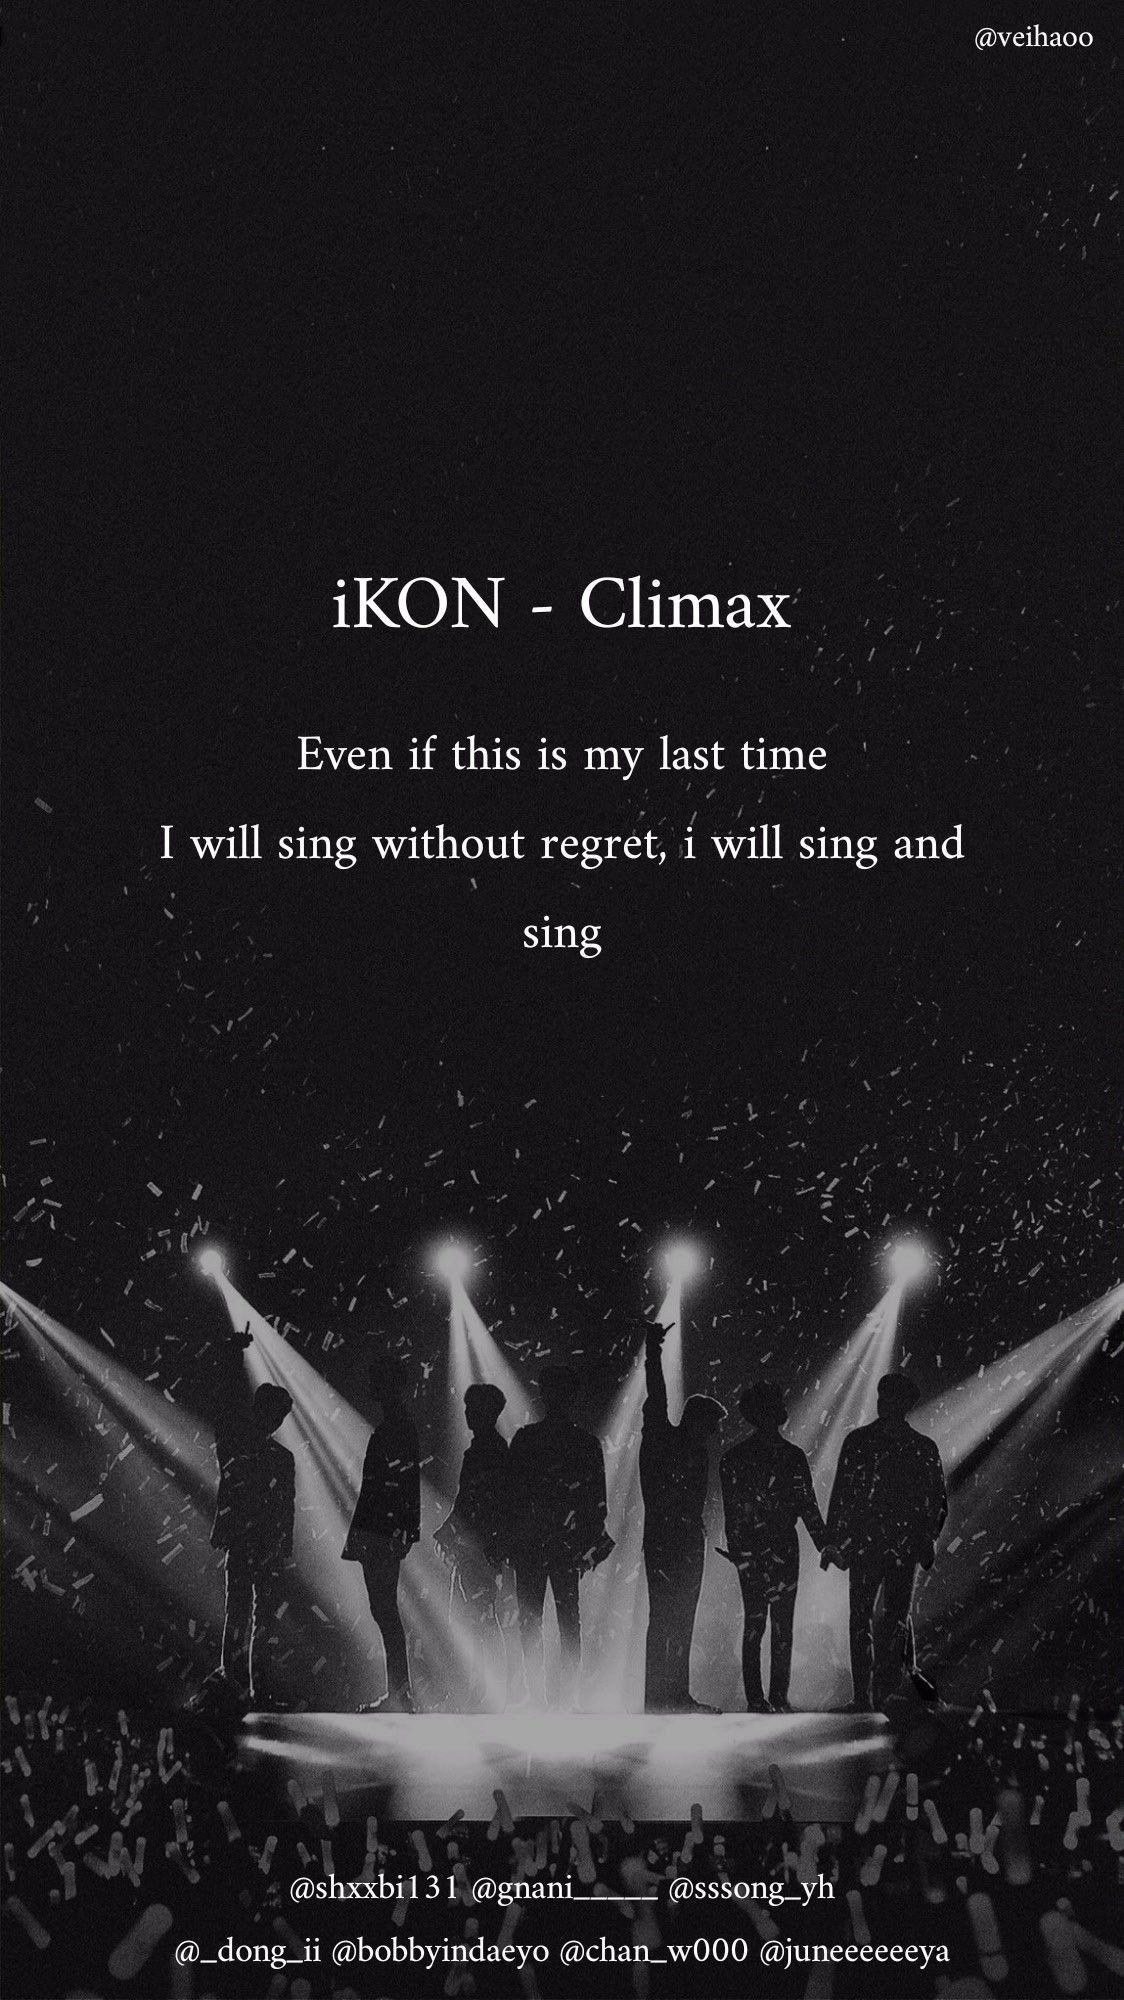 Ikon Climax Kutipan Lirik Lirik Lagu Kata Kata Indah Aesthetic ikon lyrics wallpaper